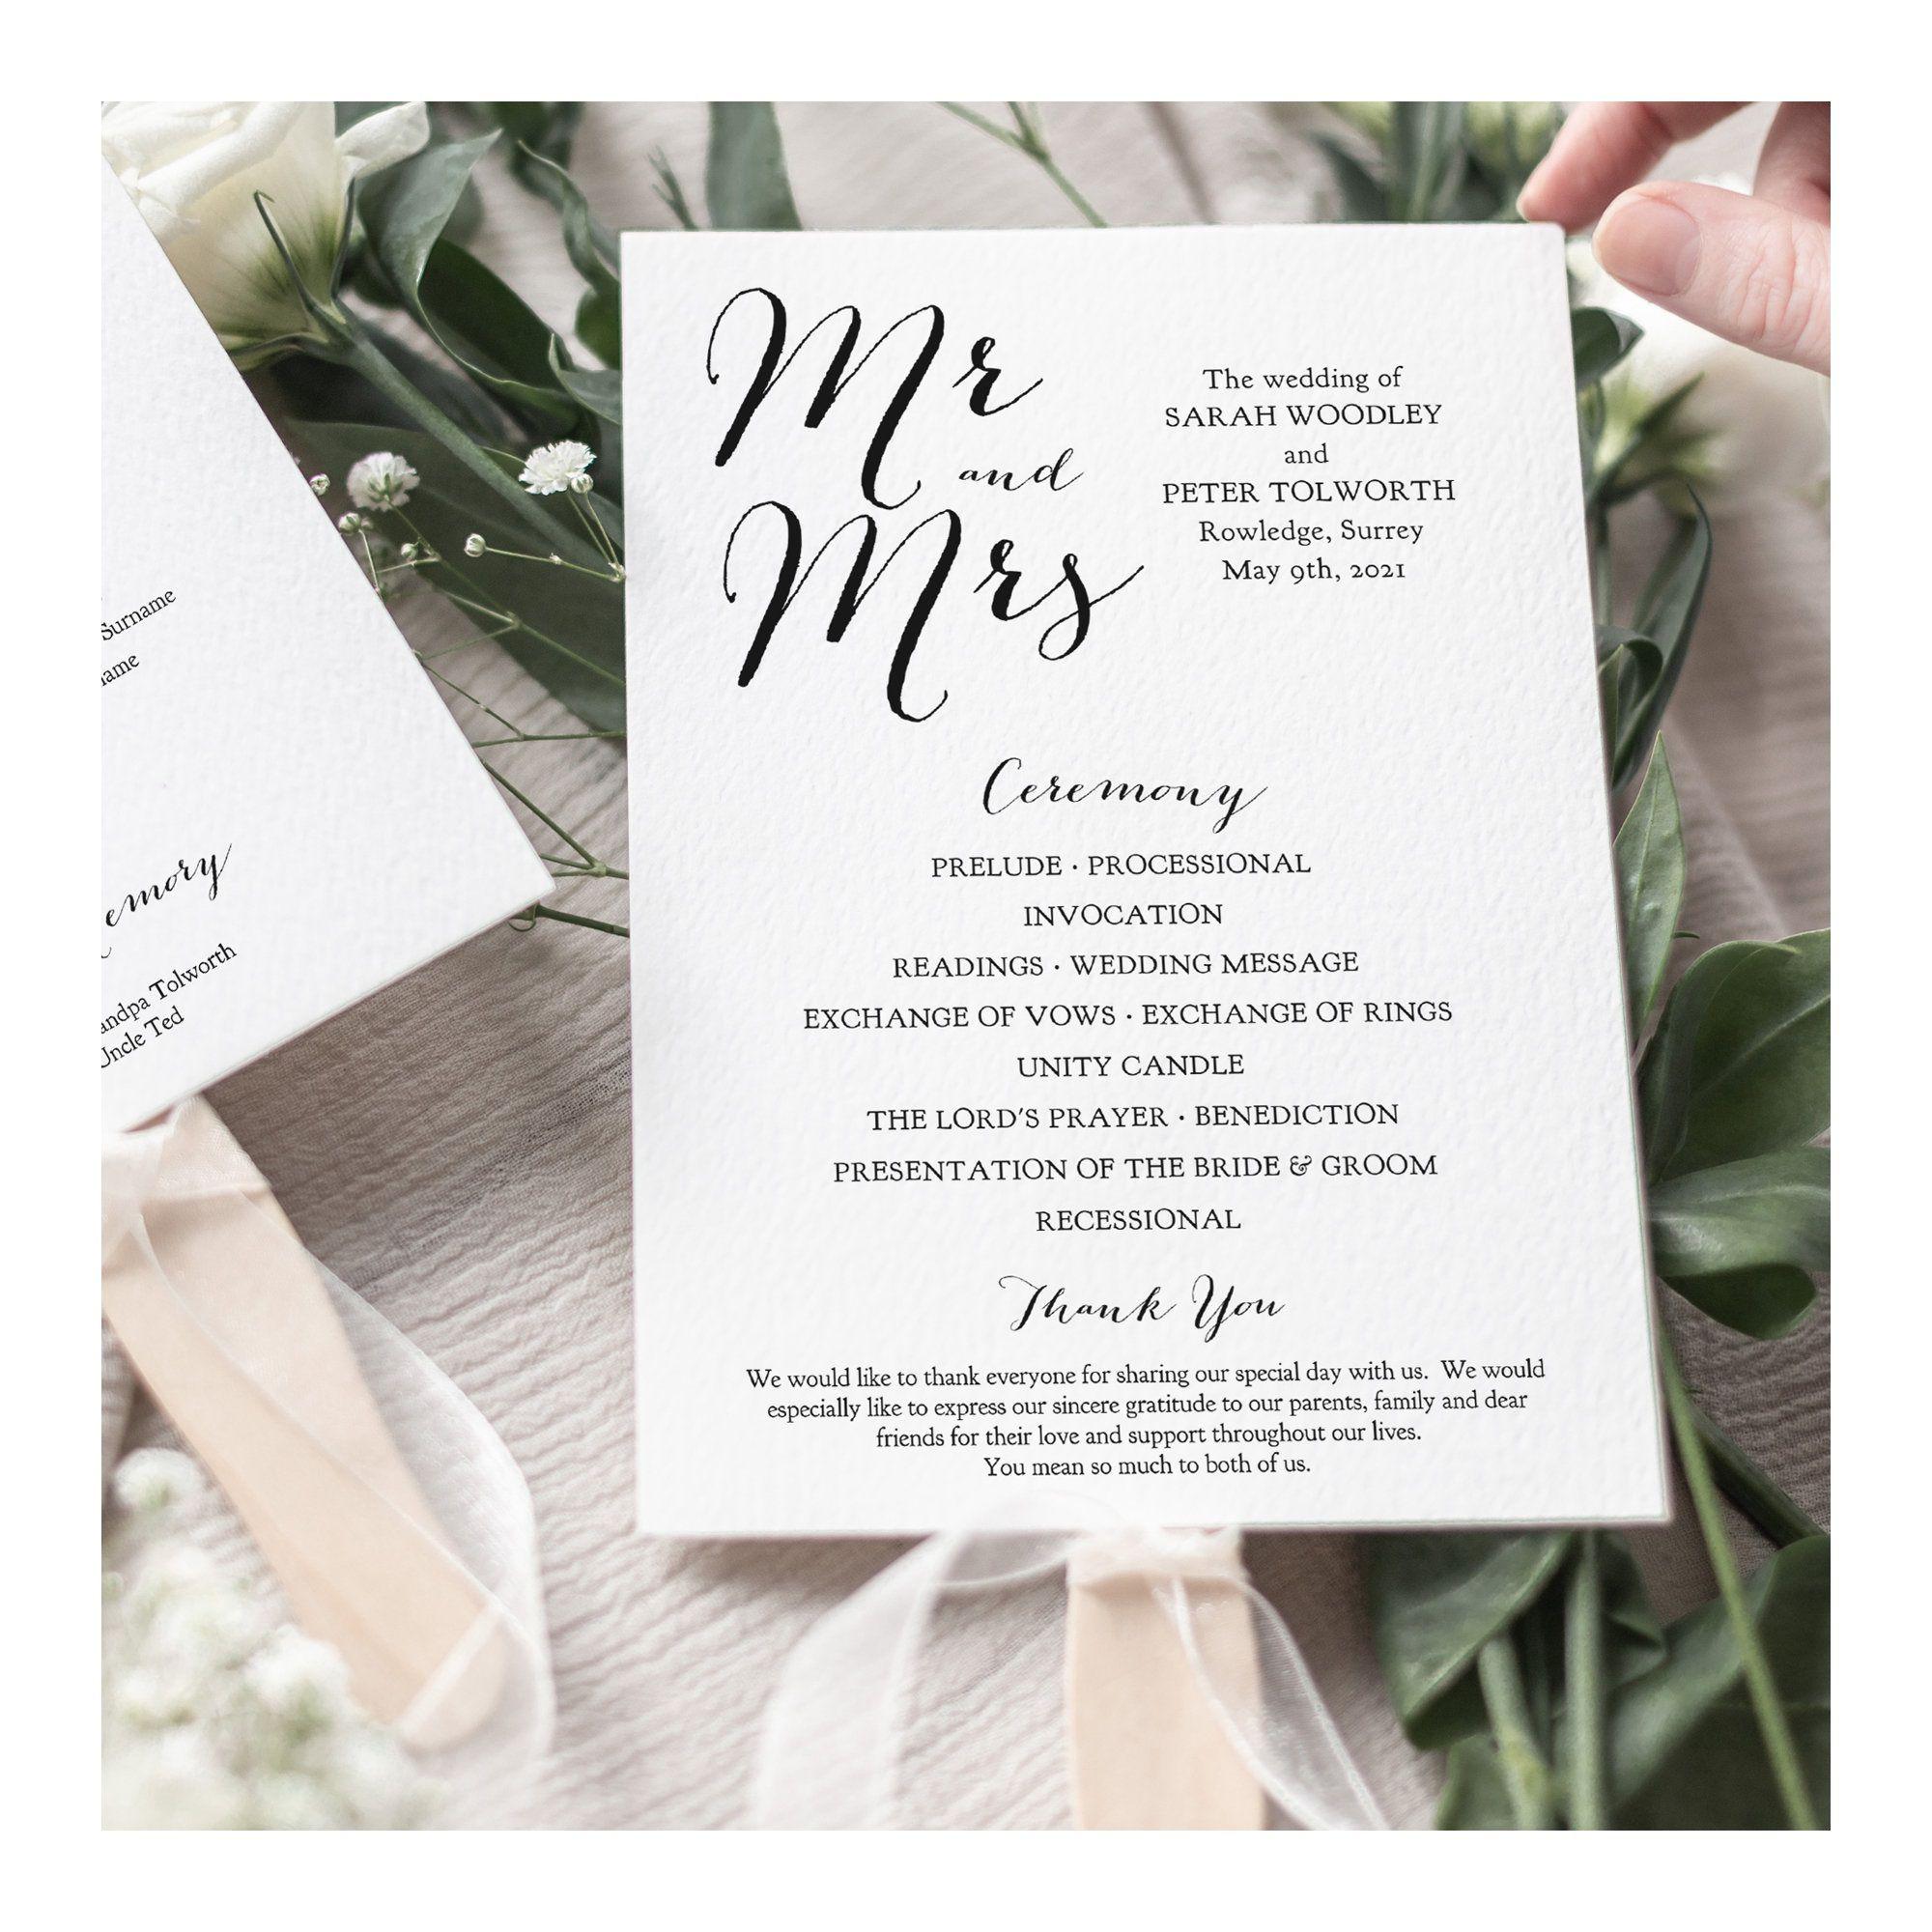 007 Astounding Free Wedding Program Fan Template Design  Templates Printable Paddle WordFull